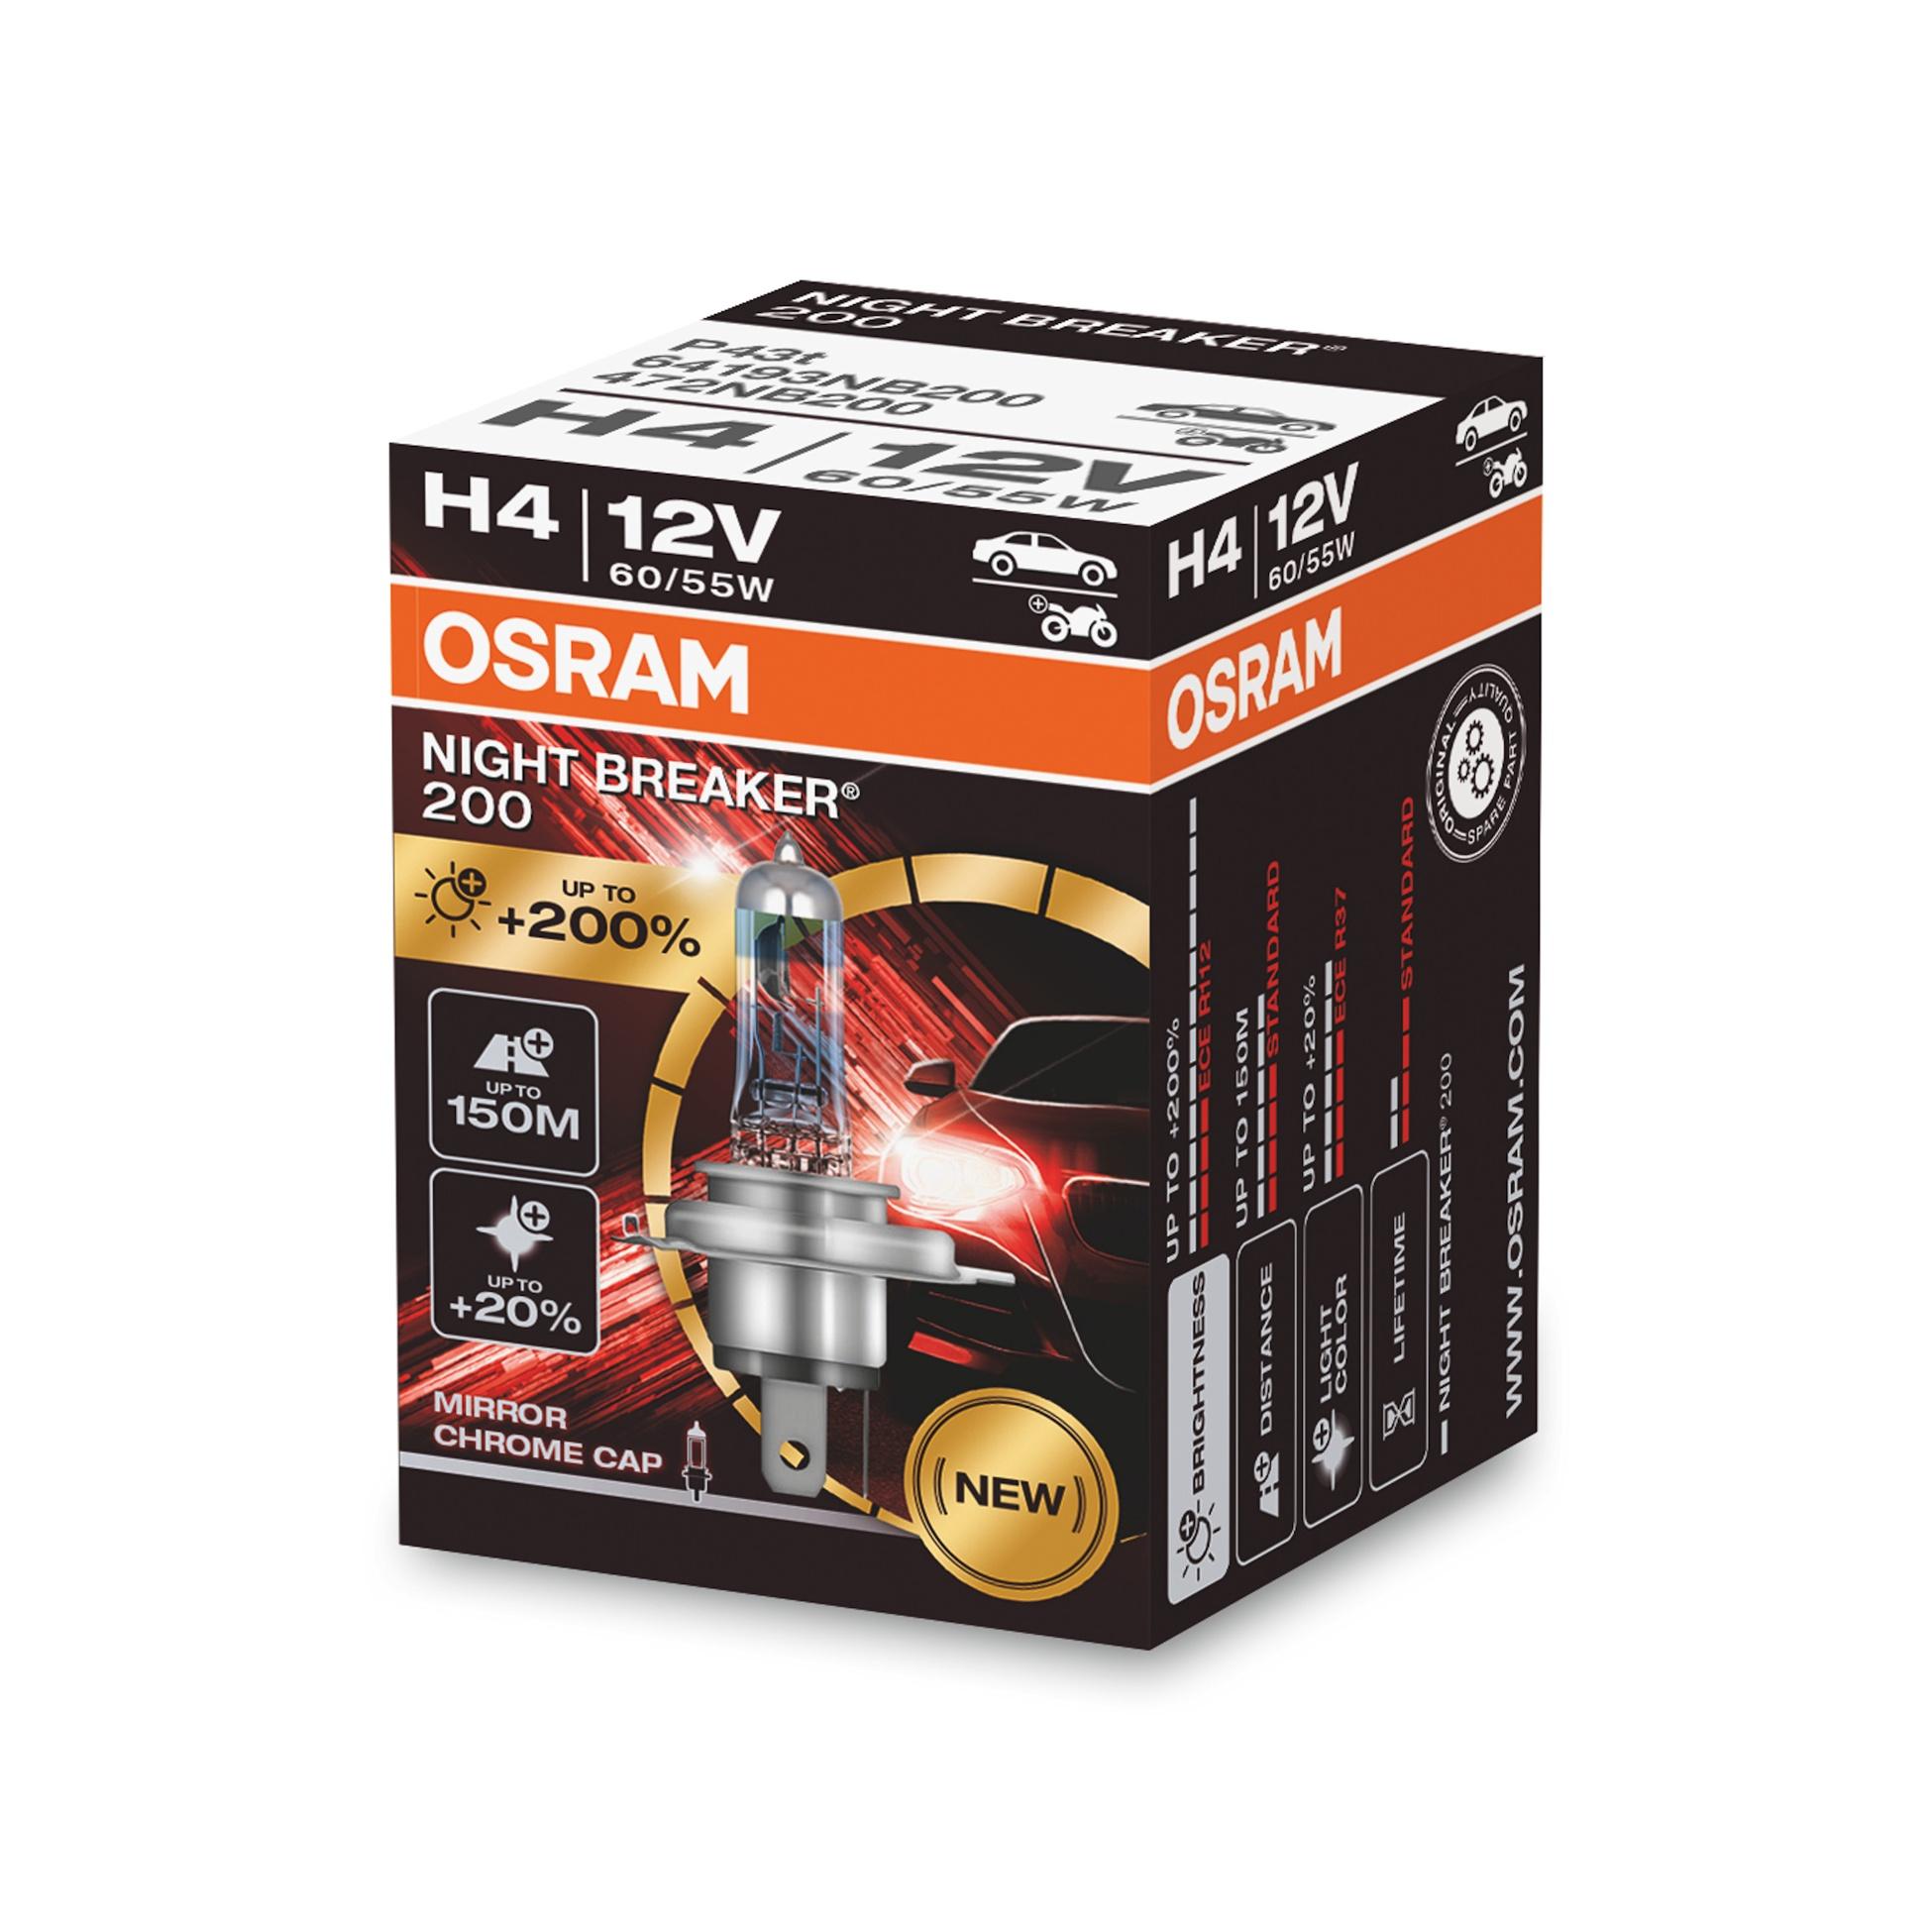 Osram Night Breaker 200 64193NB200 H4 P43t-38 12V 60/55W